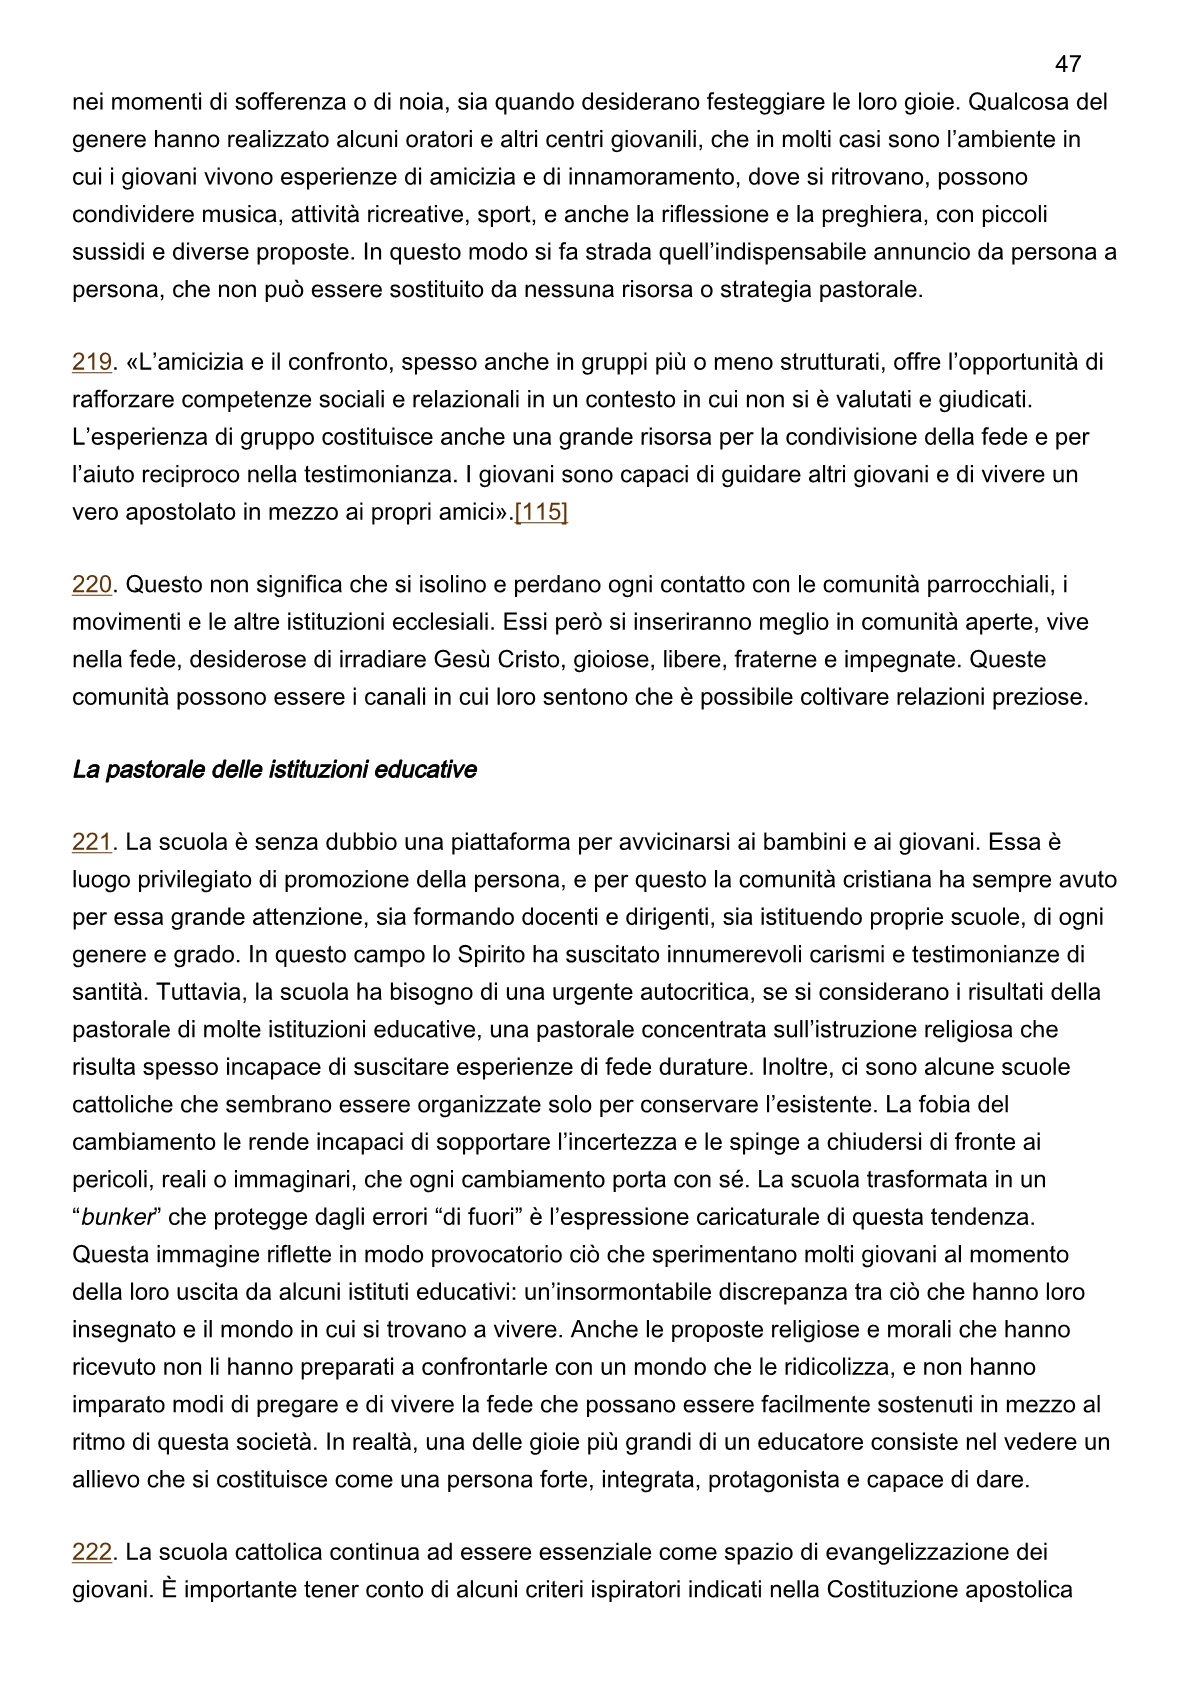 papa-francesco_esortazione-ap_20190325_christus-vivit47